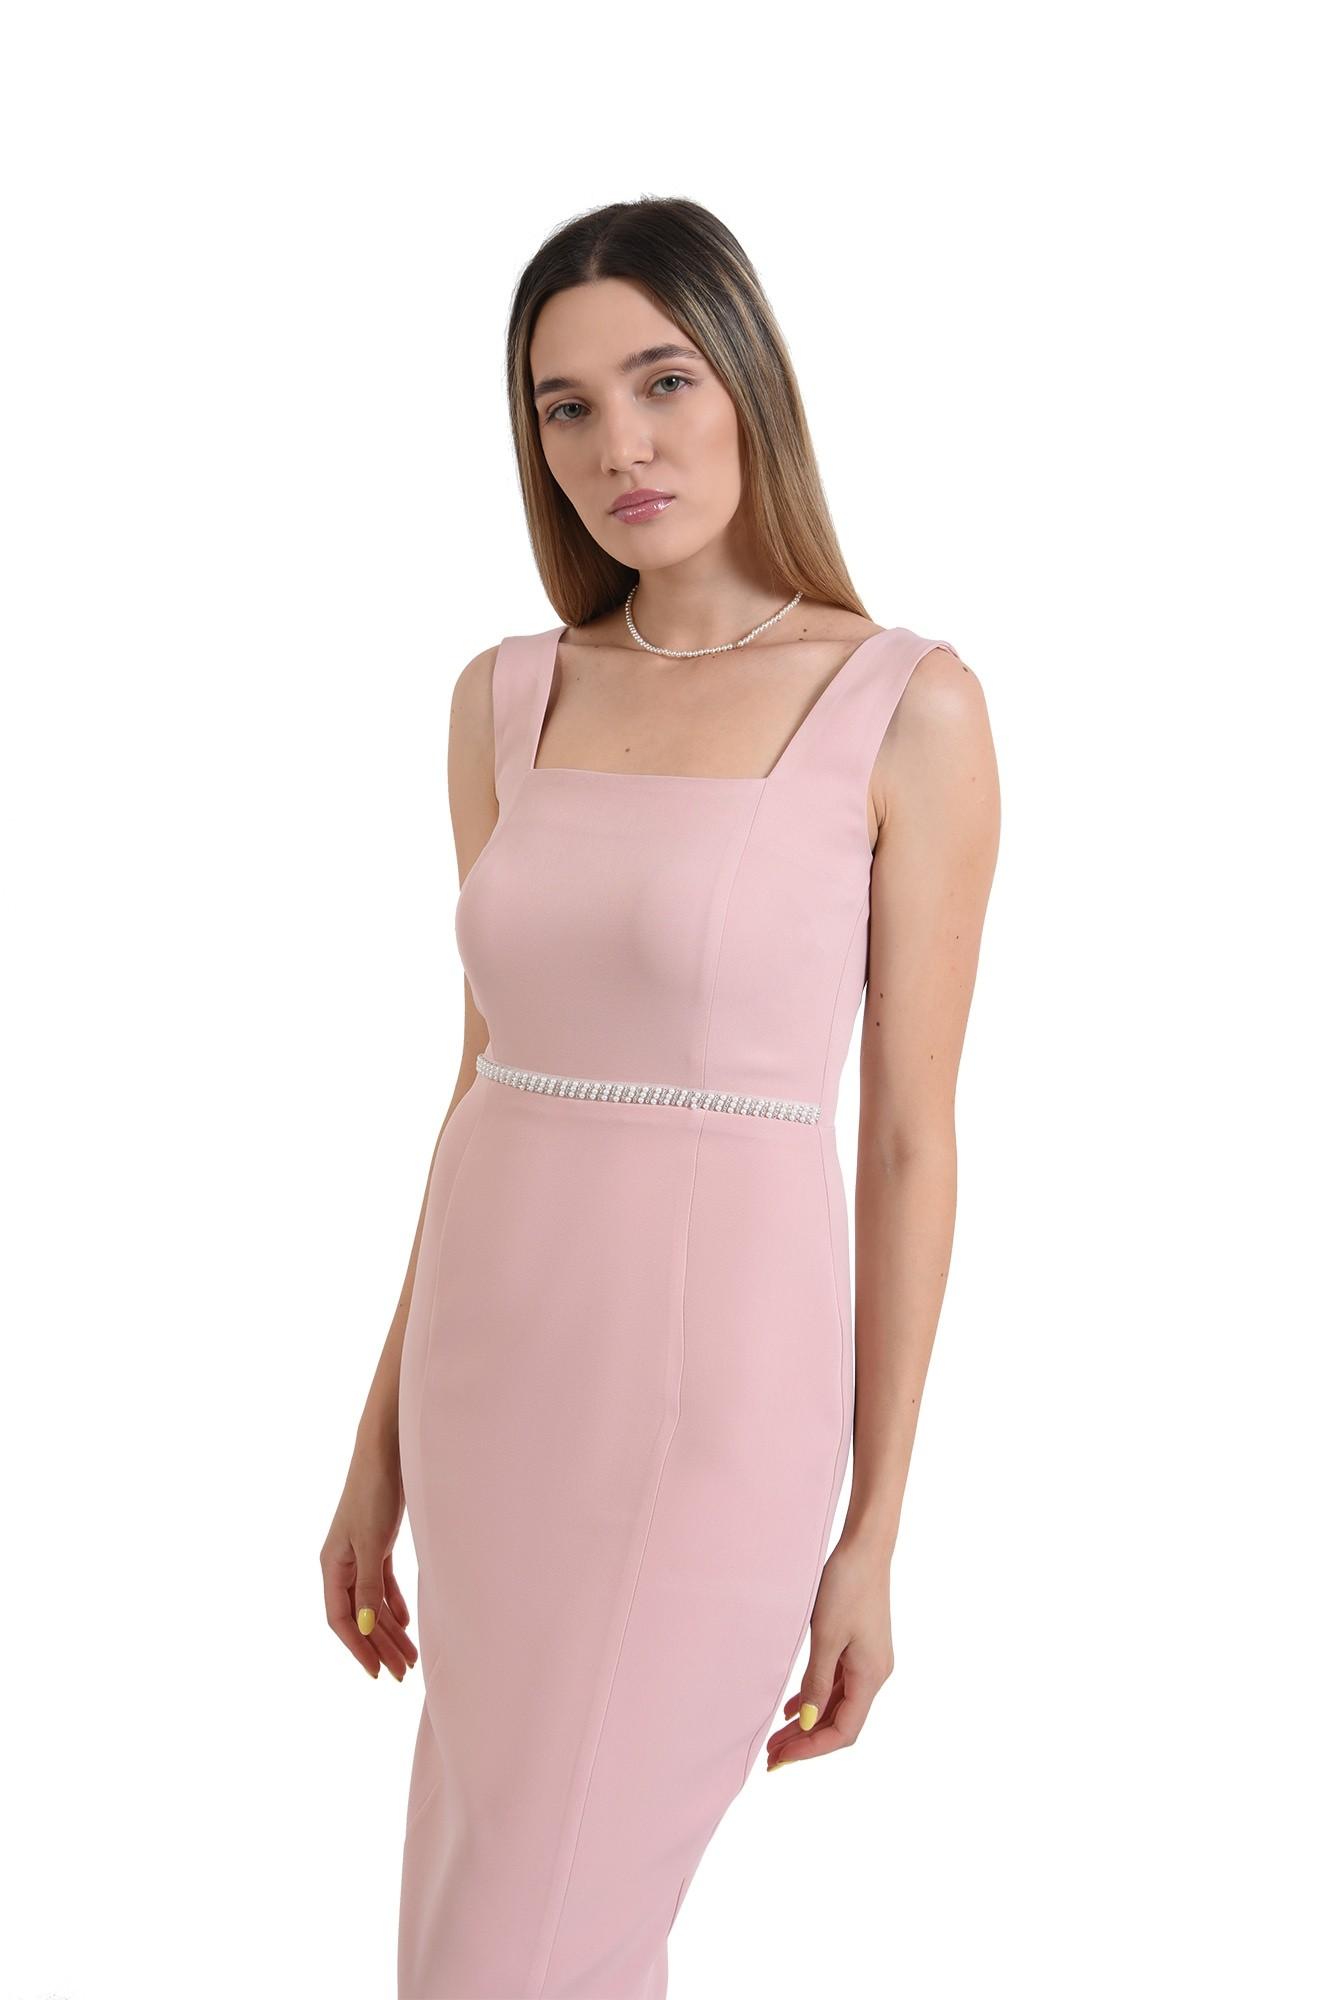 0 -  rochie eleganta, midi, conica, cu bretele, roz